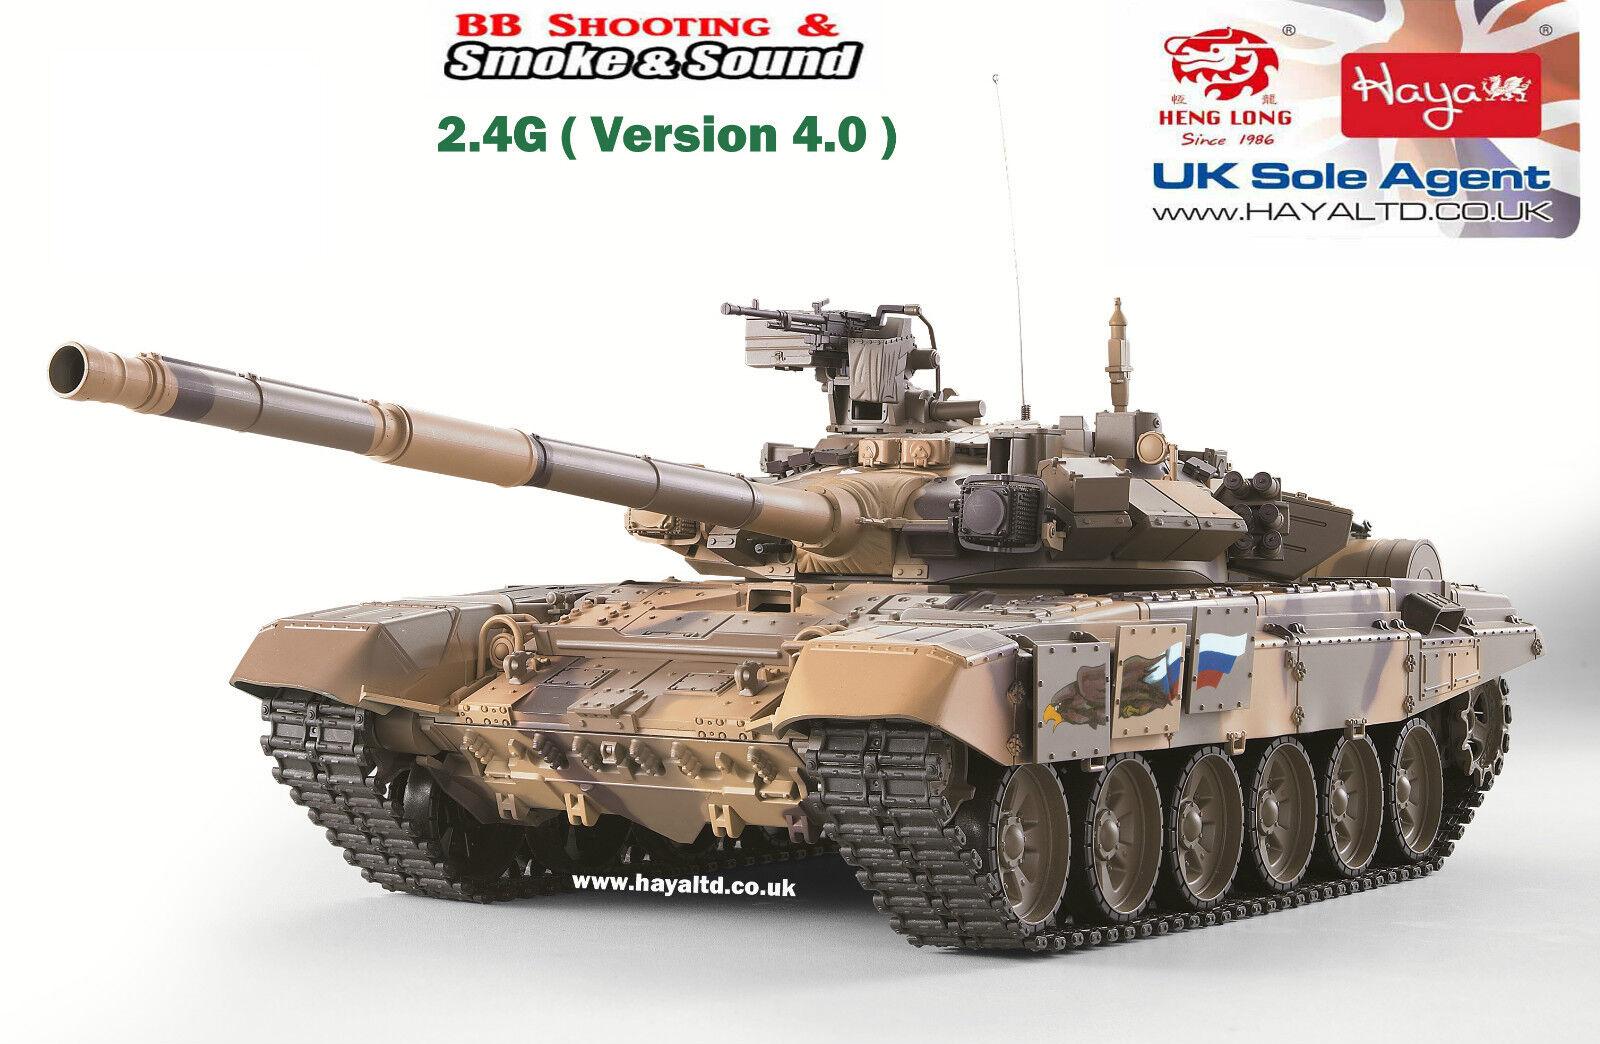 Heng long Radio Remote Control 1 16 RC Tank T90 UK